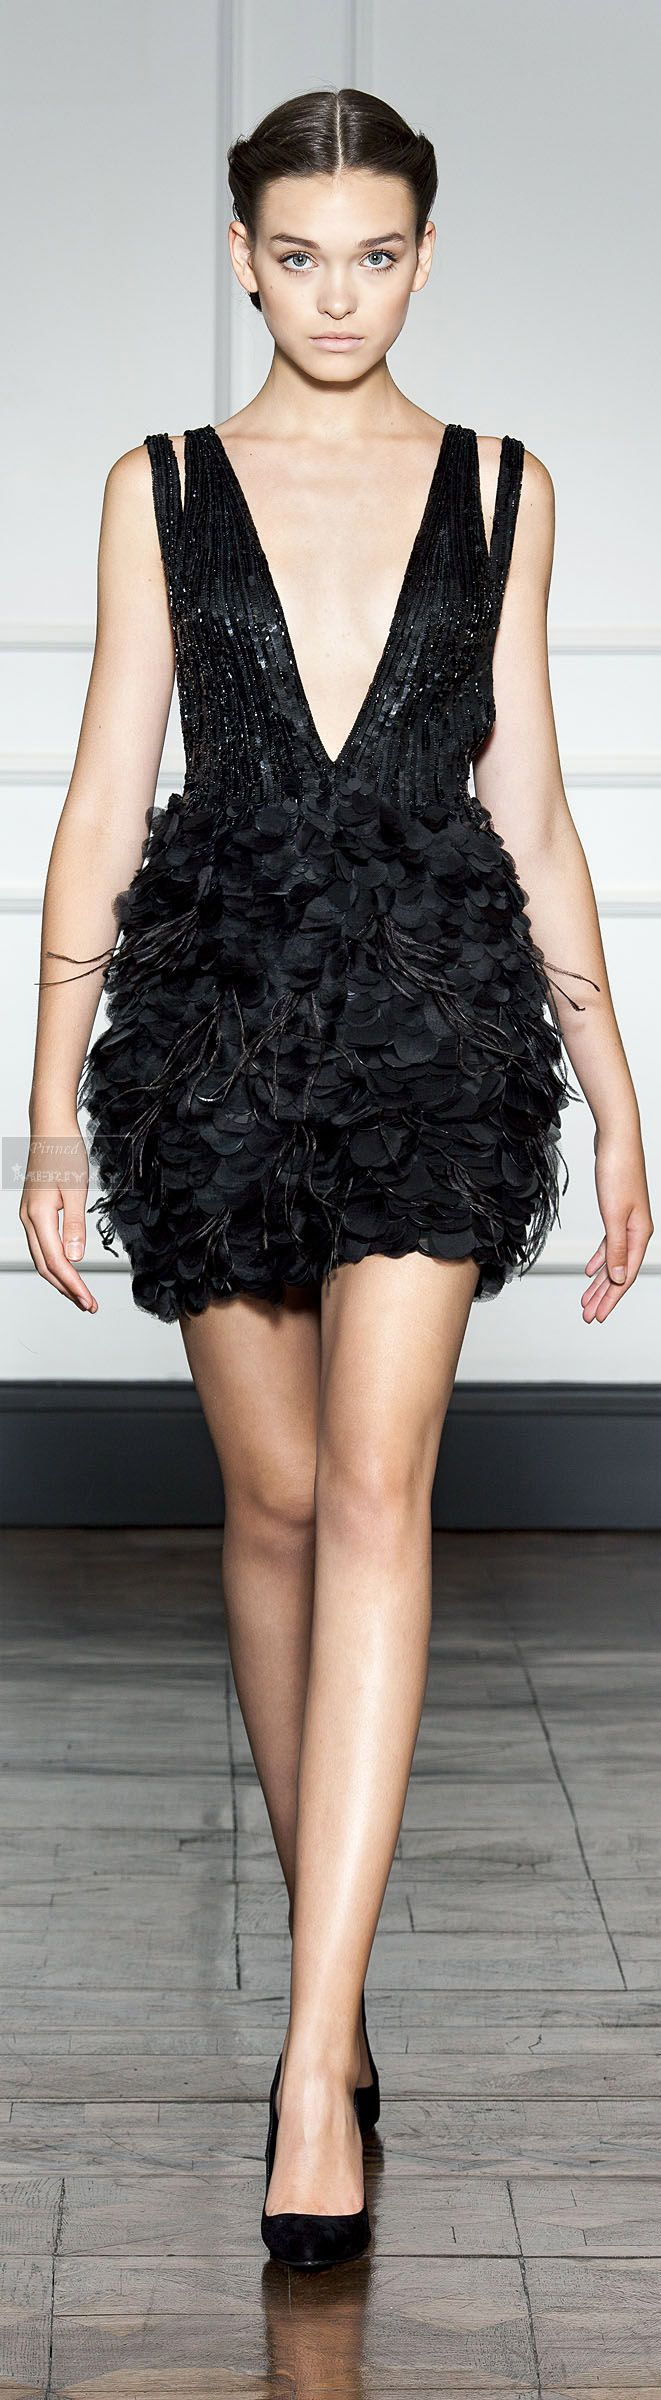 Dilek hanif black dress runway style fashion moda femenina que